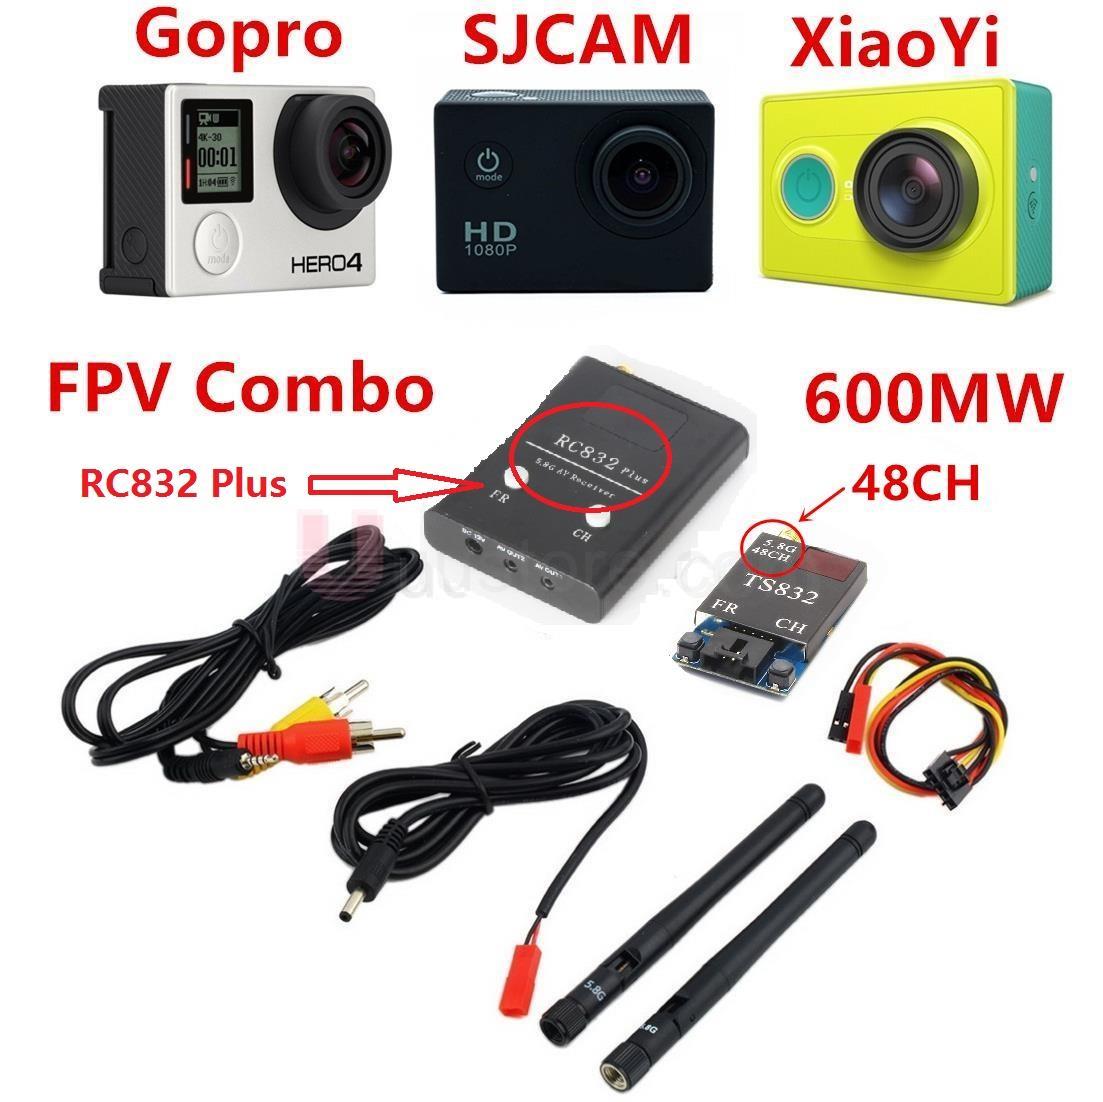 FPV System Boscam 5.8Ghz 600mW 48CH Transmitter TS832 &Receiver RC832 Plus FPV System For QAV210 QAV250 Drone Quadcopter Walkera wdiy for qav250  fpv drong    machine